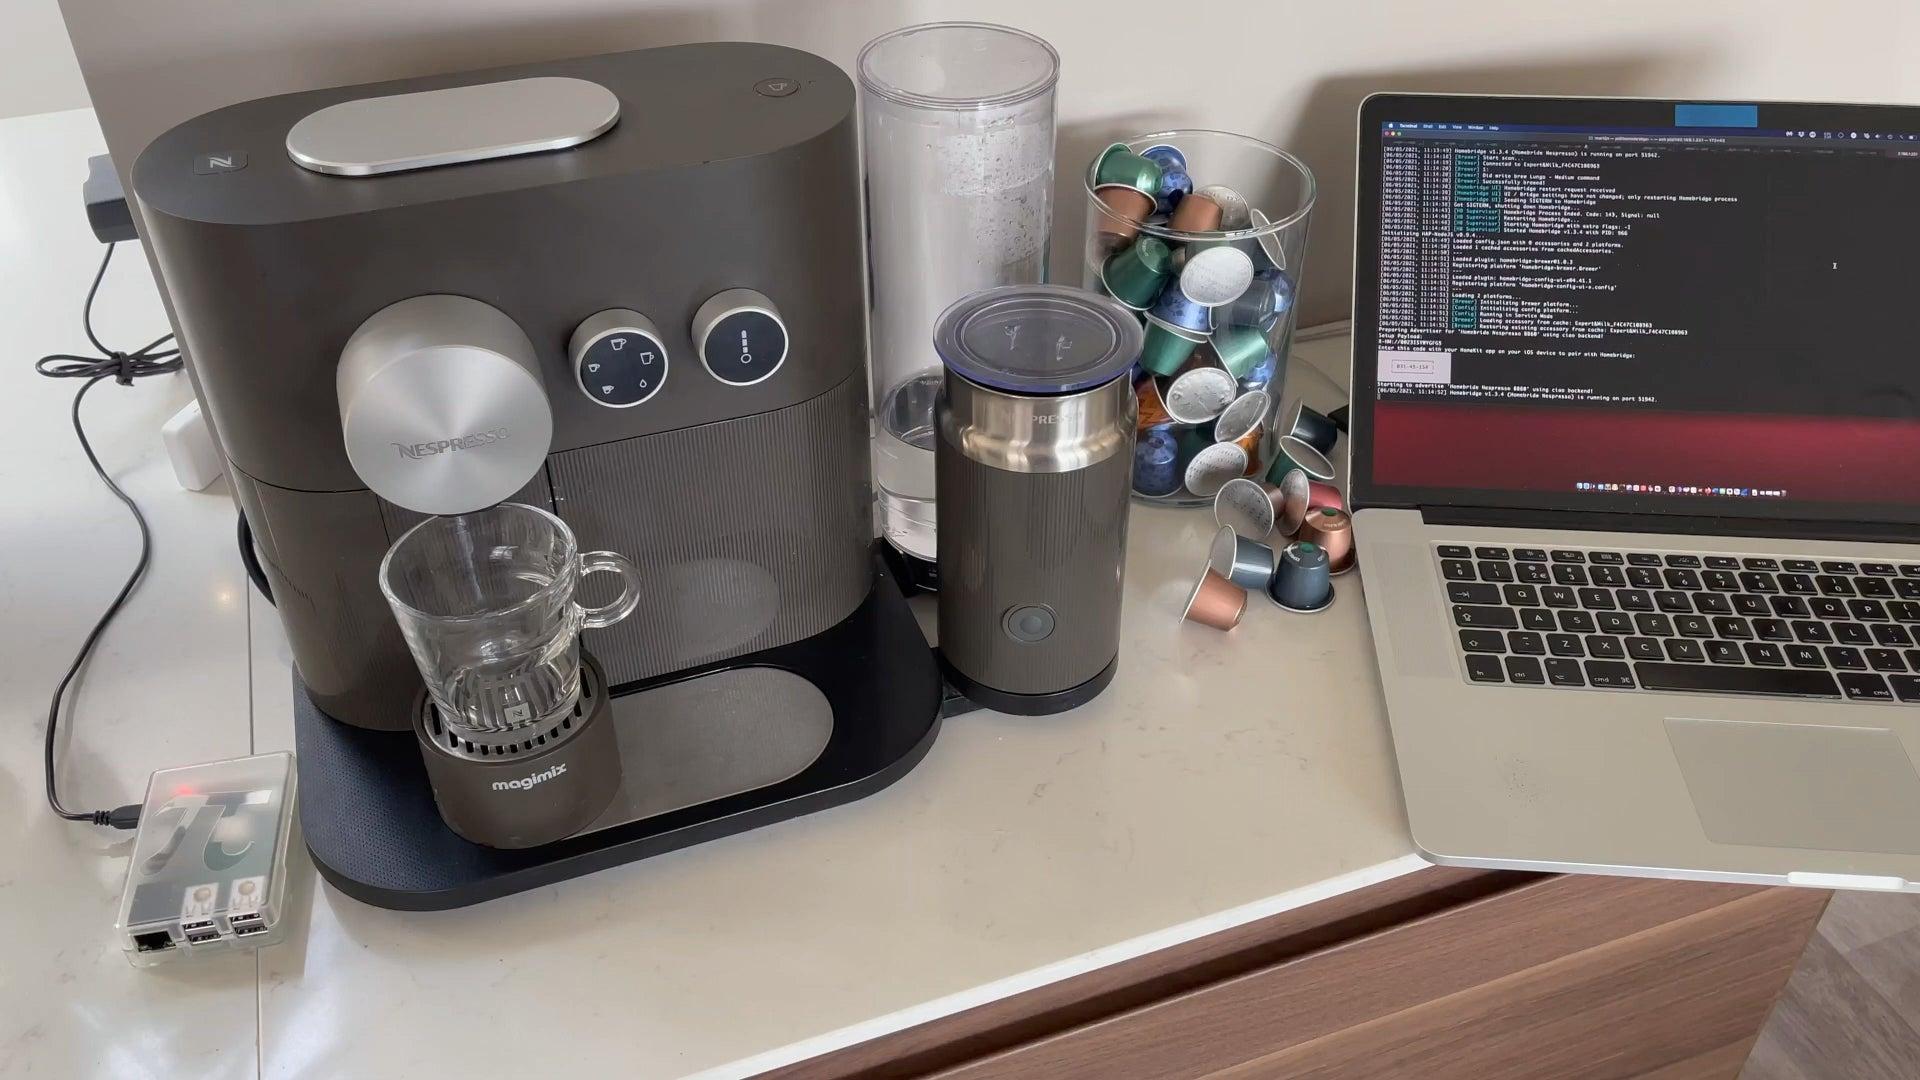 I got my Nespresso coffee machine with HomeKit via Homebridge brewer